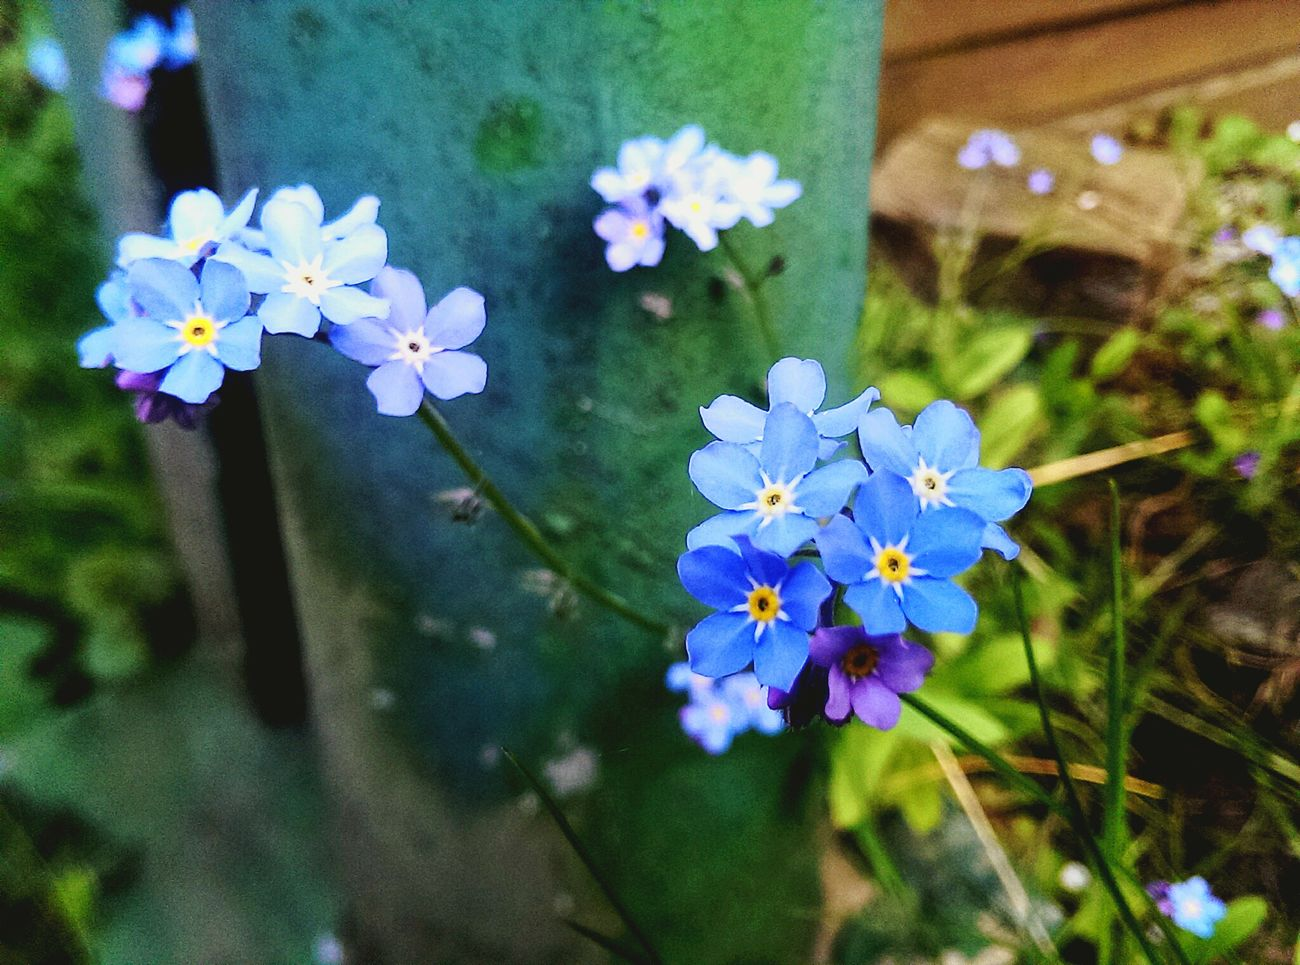 Nahaufnahme Flower Blue Blumen Nature Naturelovers Blau EyeEm Nature Lover